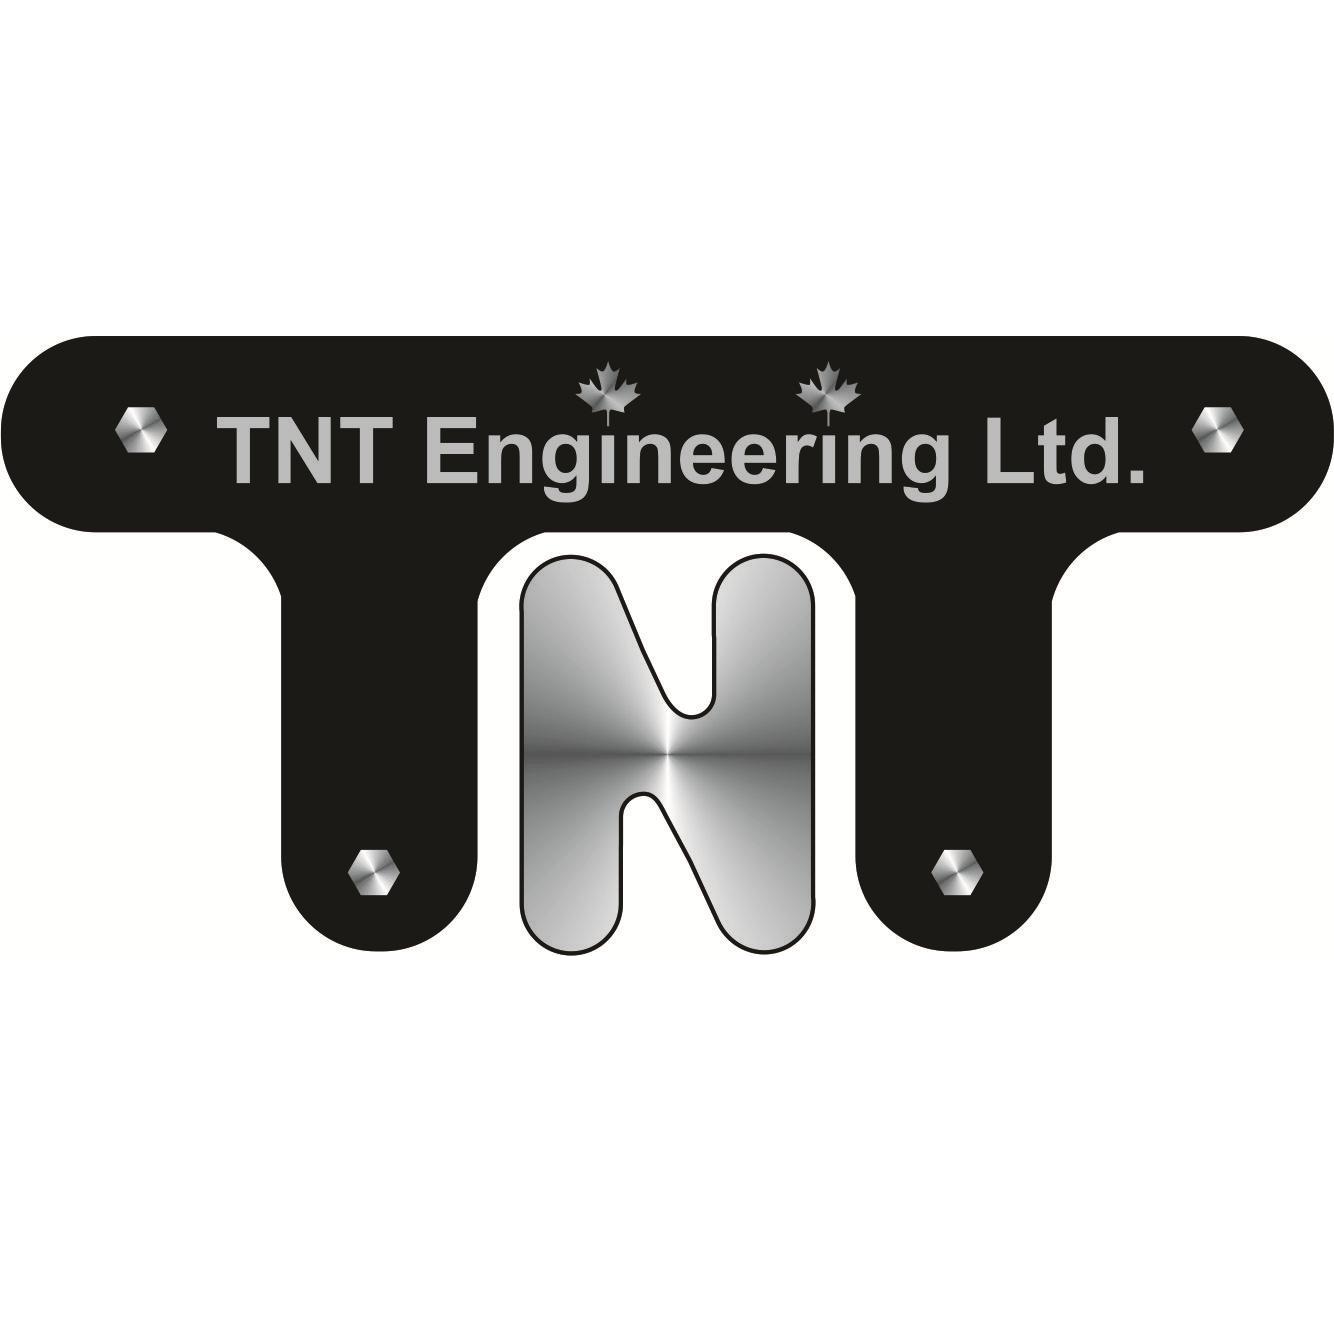 TNT Engineering Ltd logo